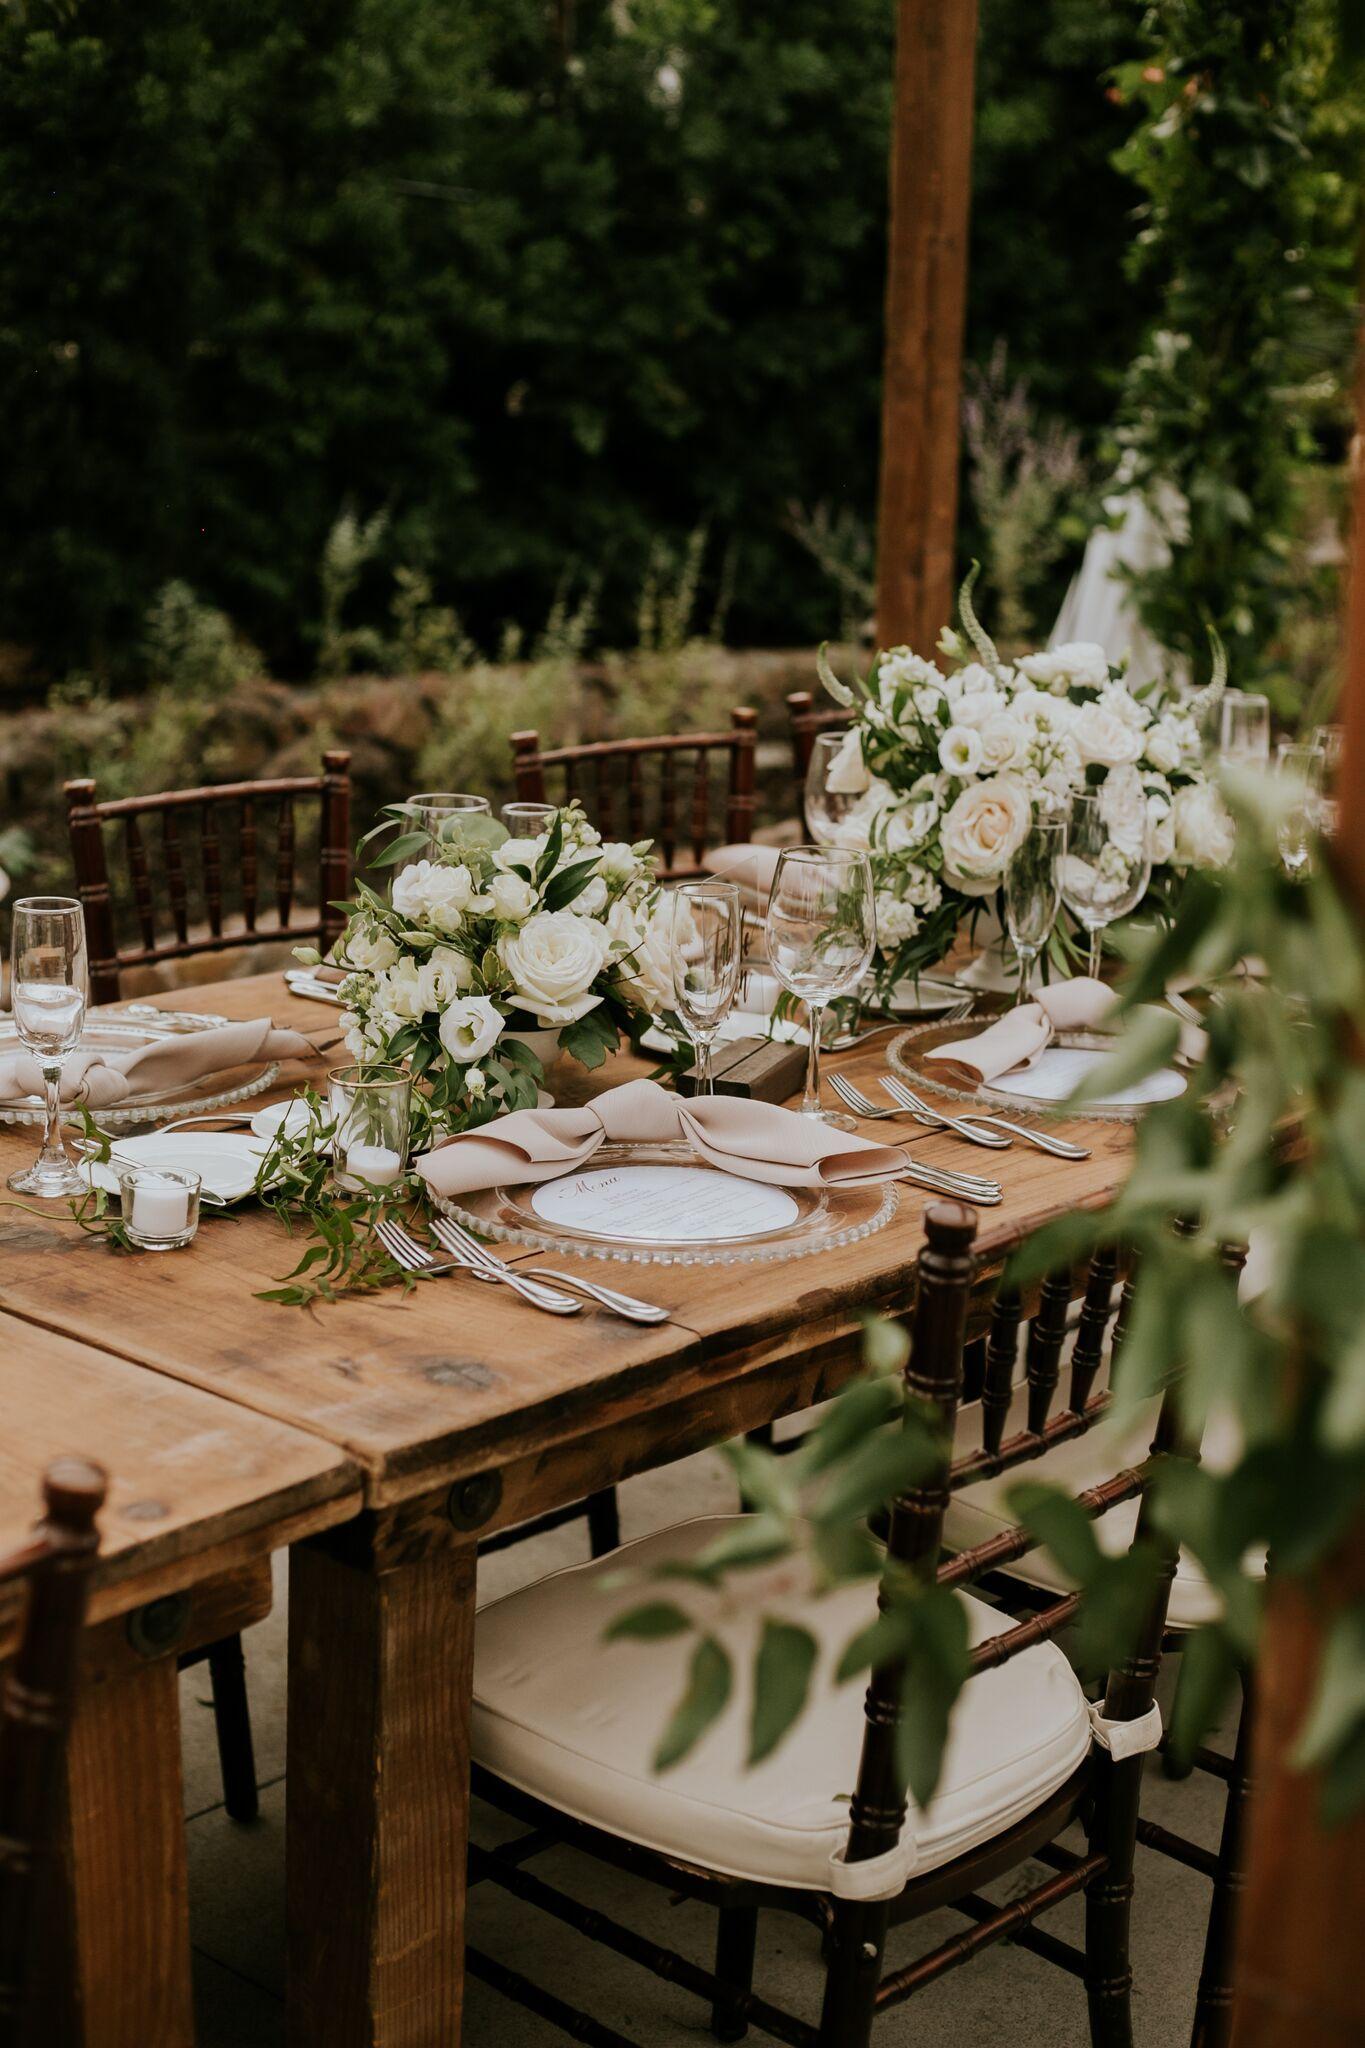 More Rentals Inc San Diego Table Rentals San Diego Wedding Rentals Southern C Garden Theme Wedding Wedding Table Decorations Wedding Southern California